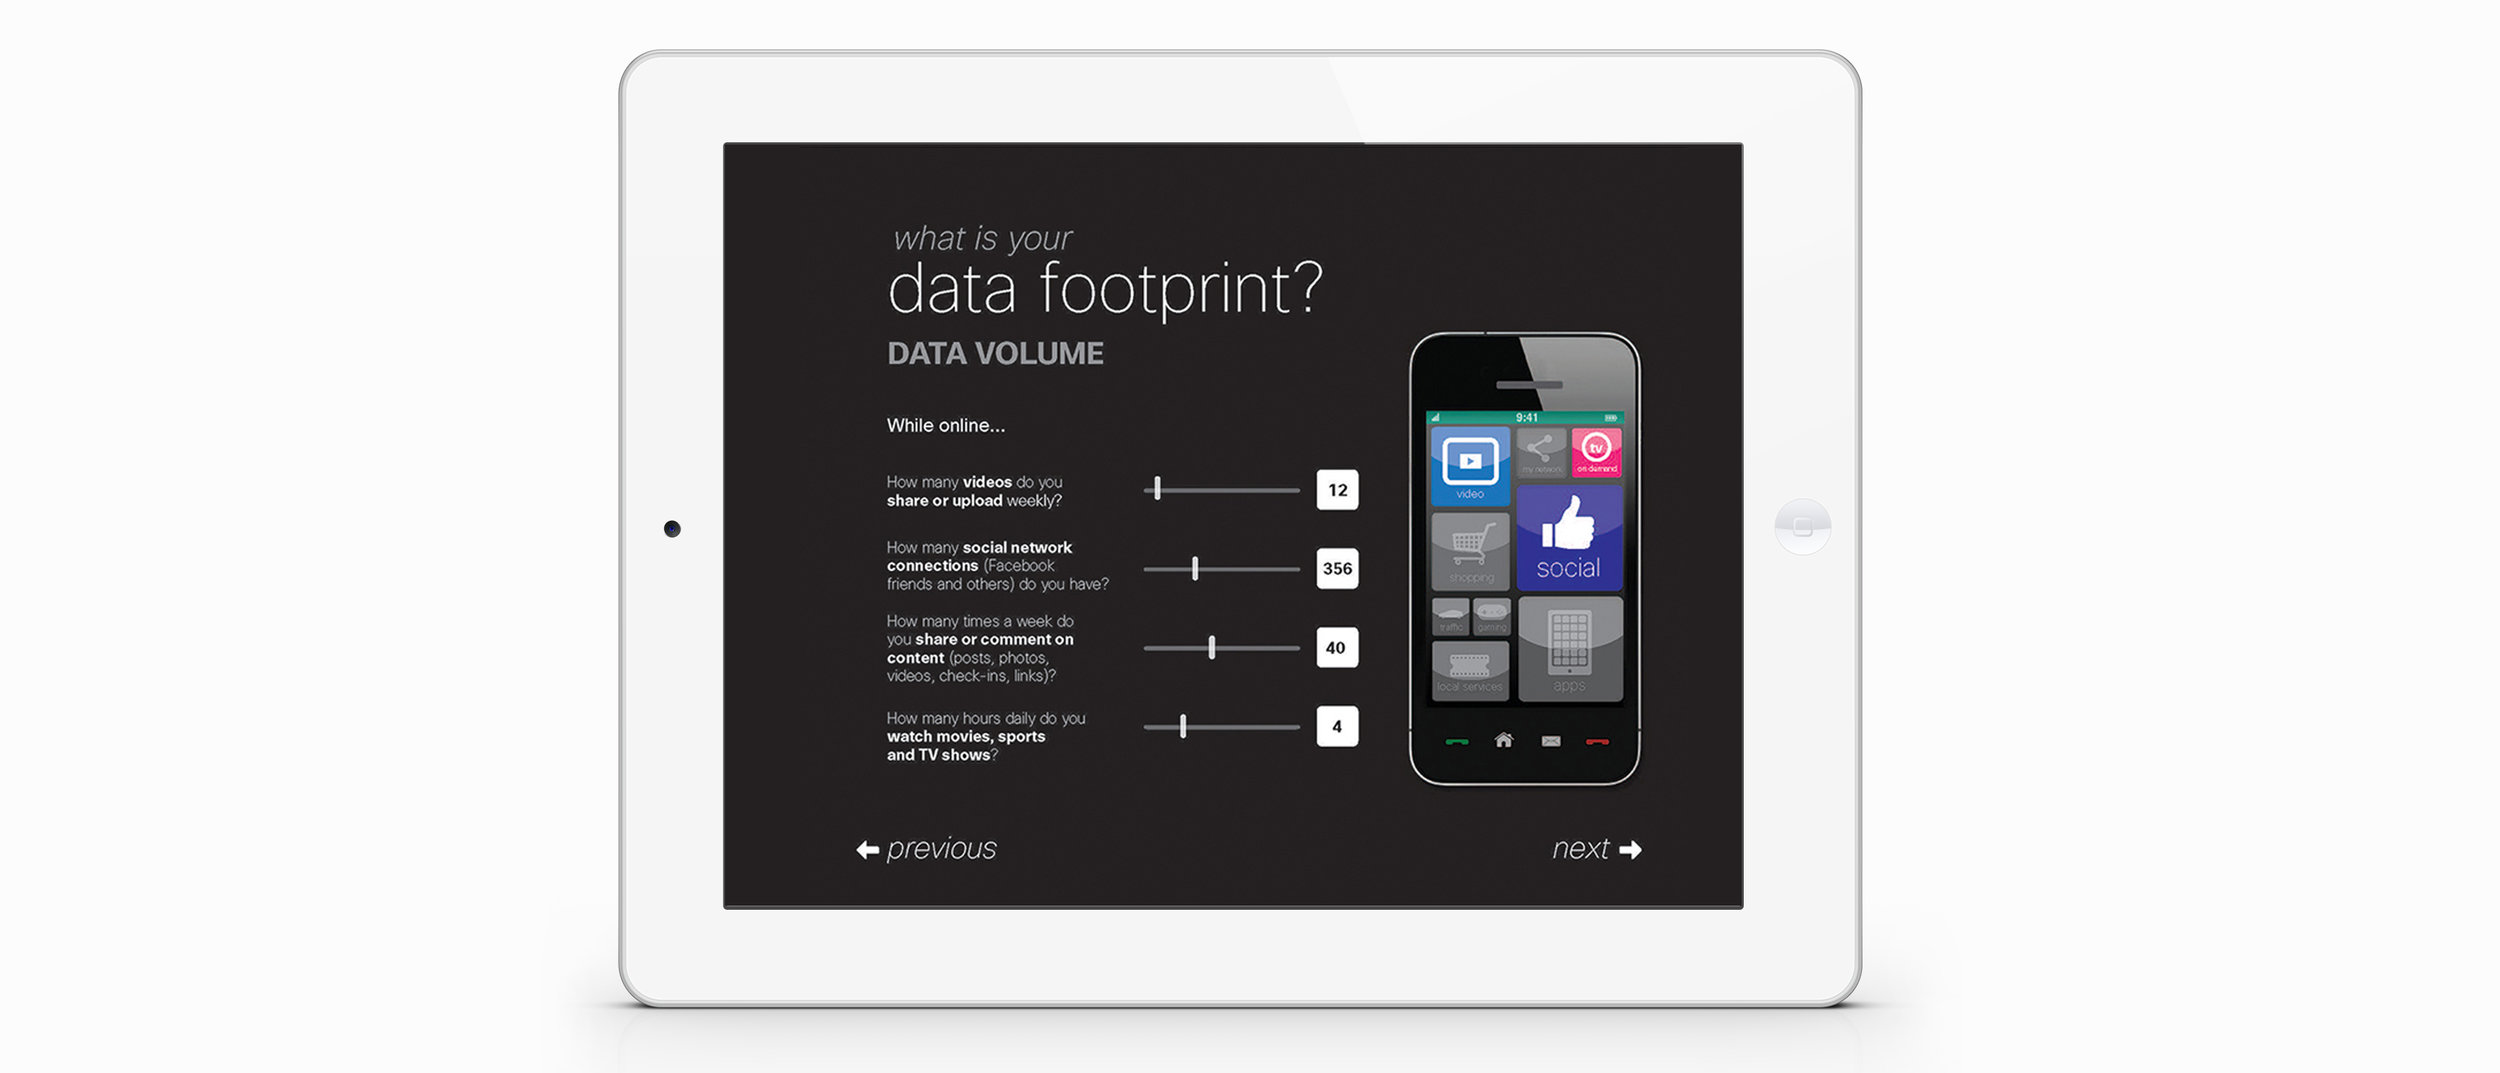 Footprint_iPad_3 copy.jpg